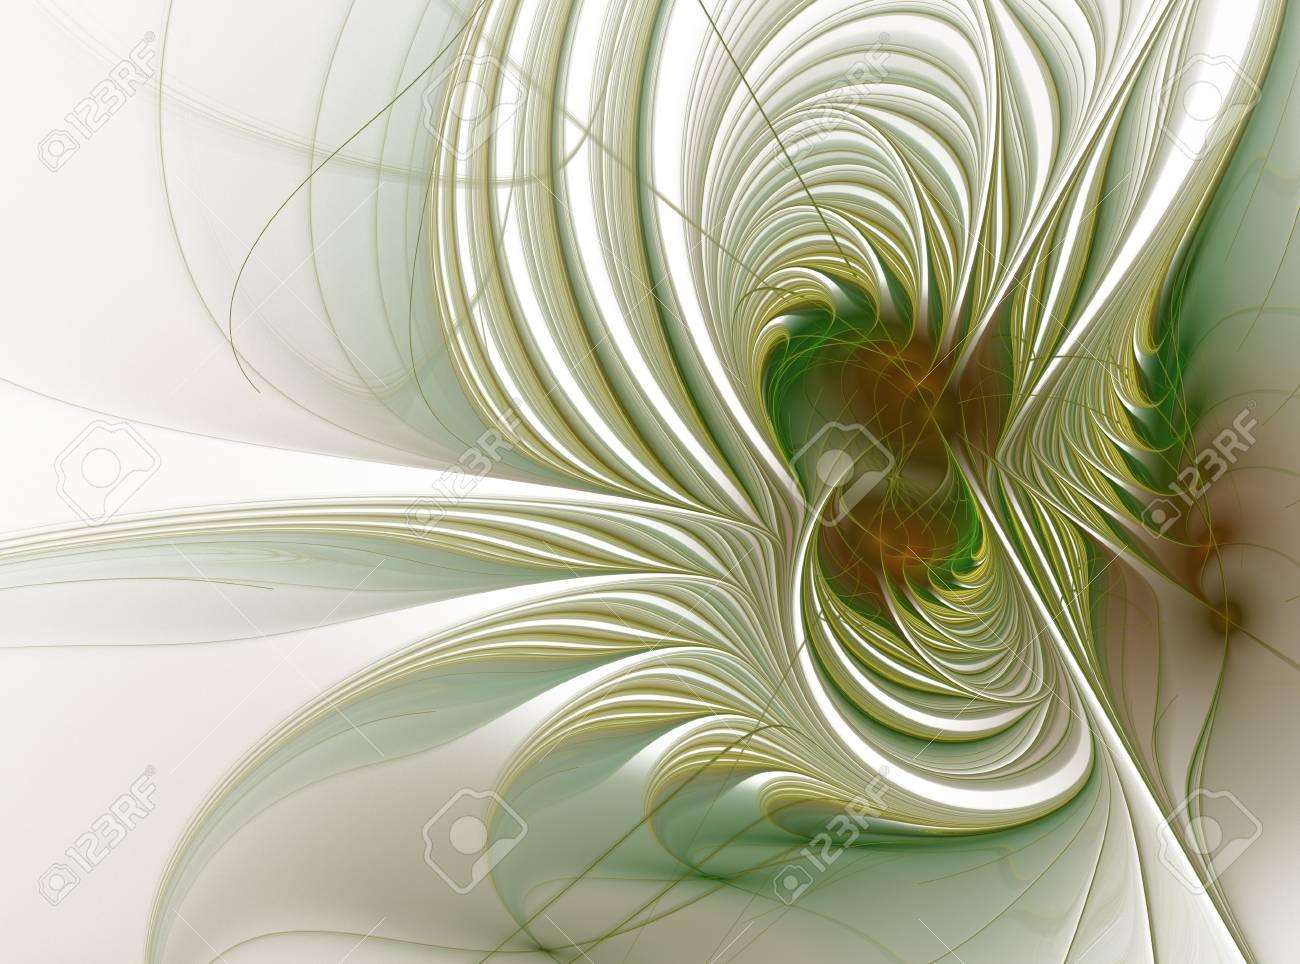 Abstract Art Computer